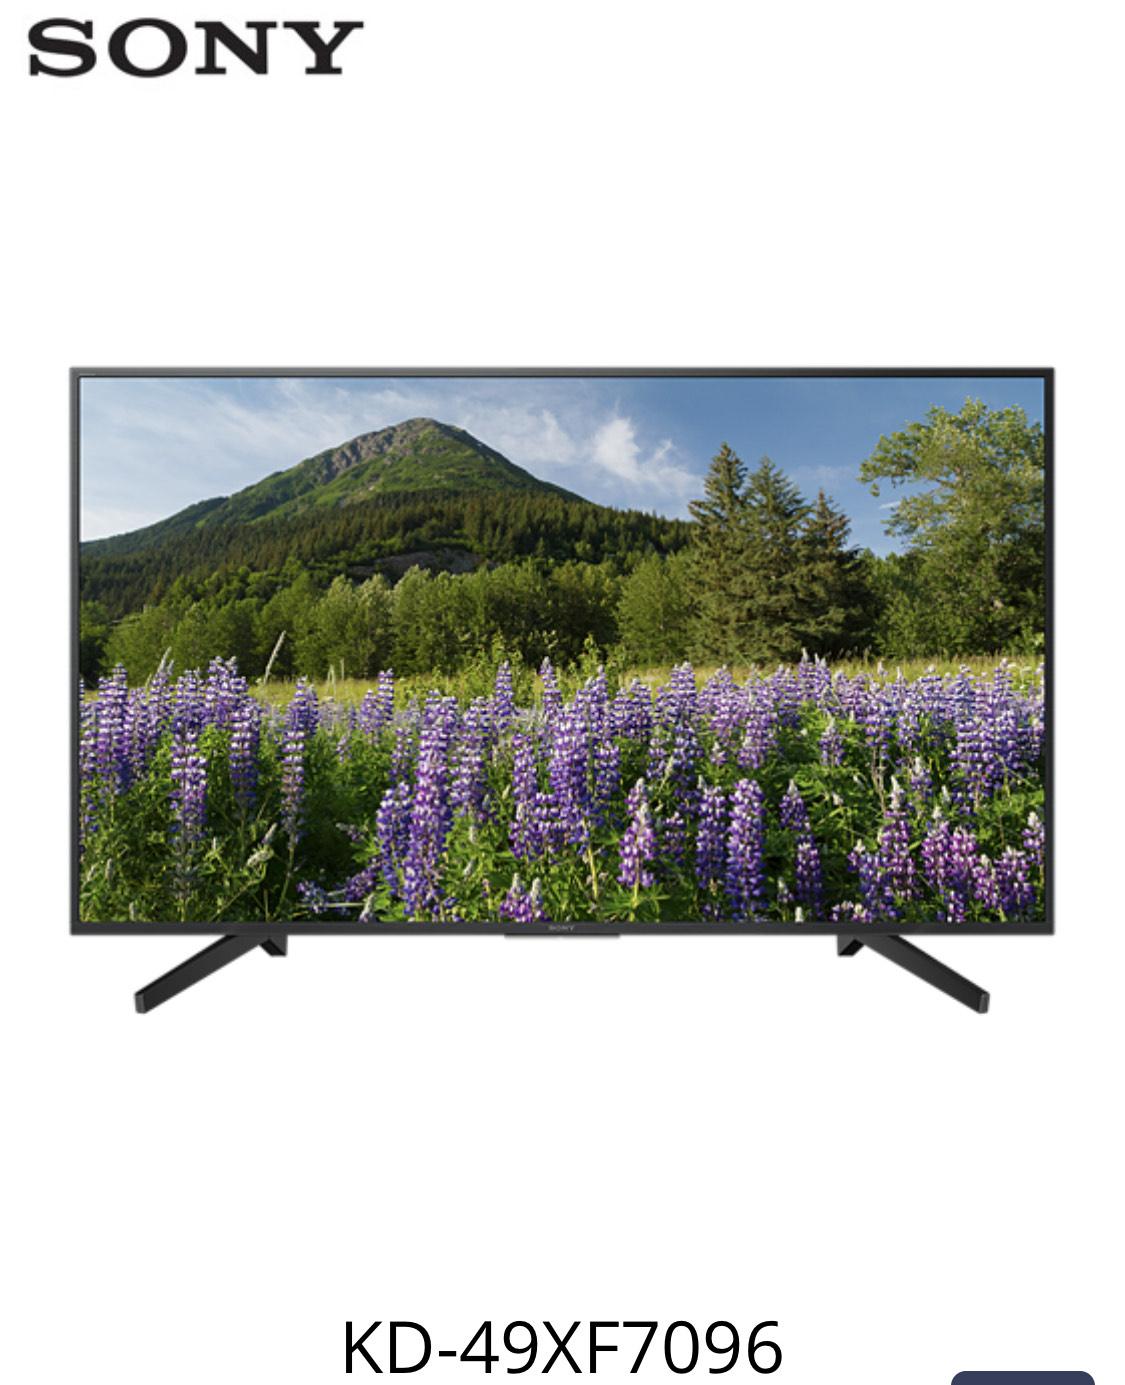 Sony KD-49XF7096 LED | 4K Ultra HD | High Dynamic Range (HDR) | Smart TV Schwarz